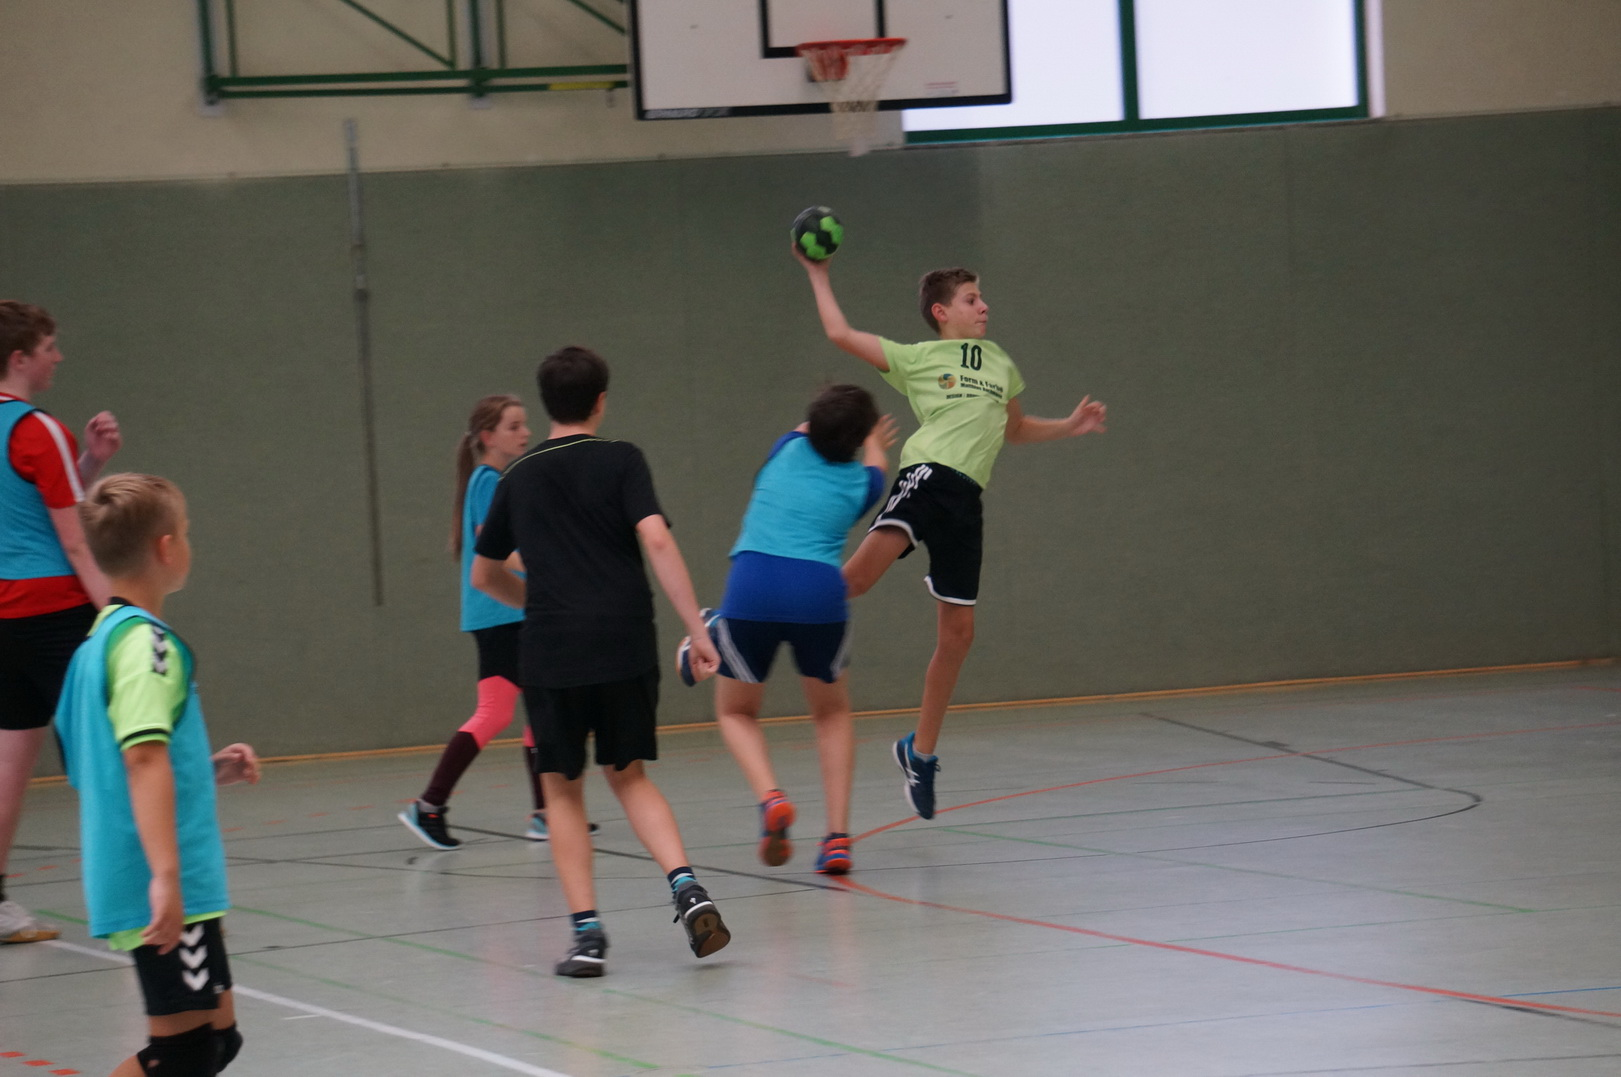 201808_Handballcamp_SDH_MG_101w